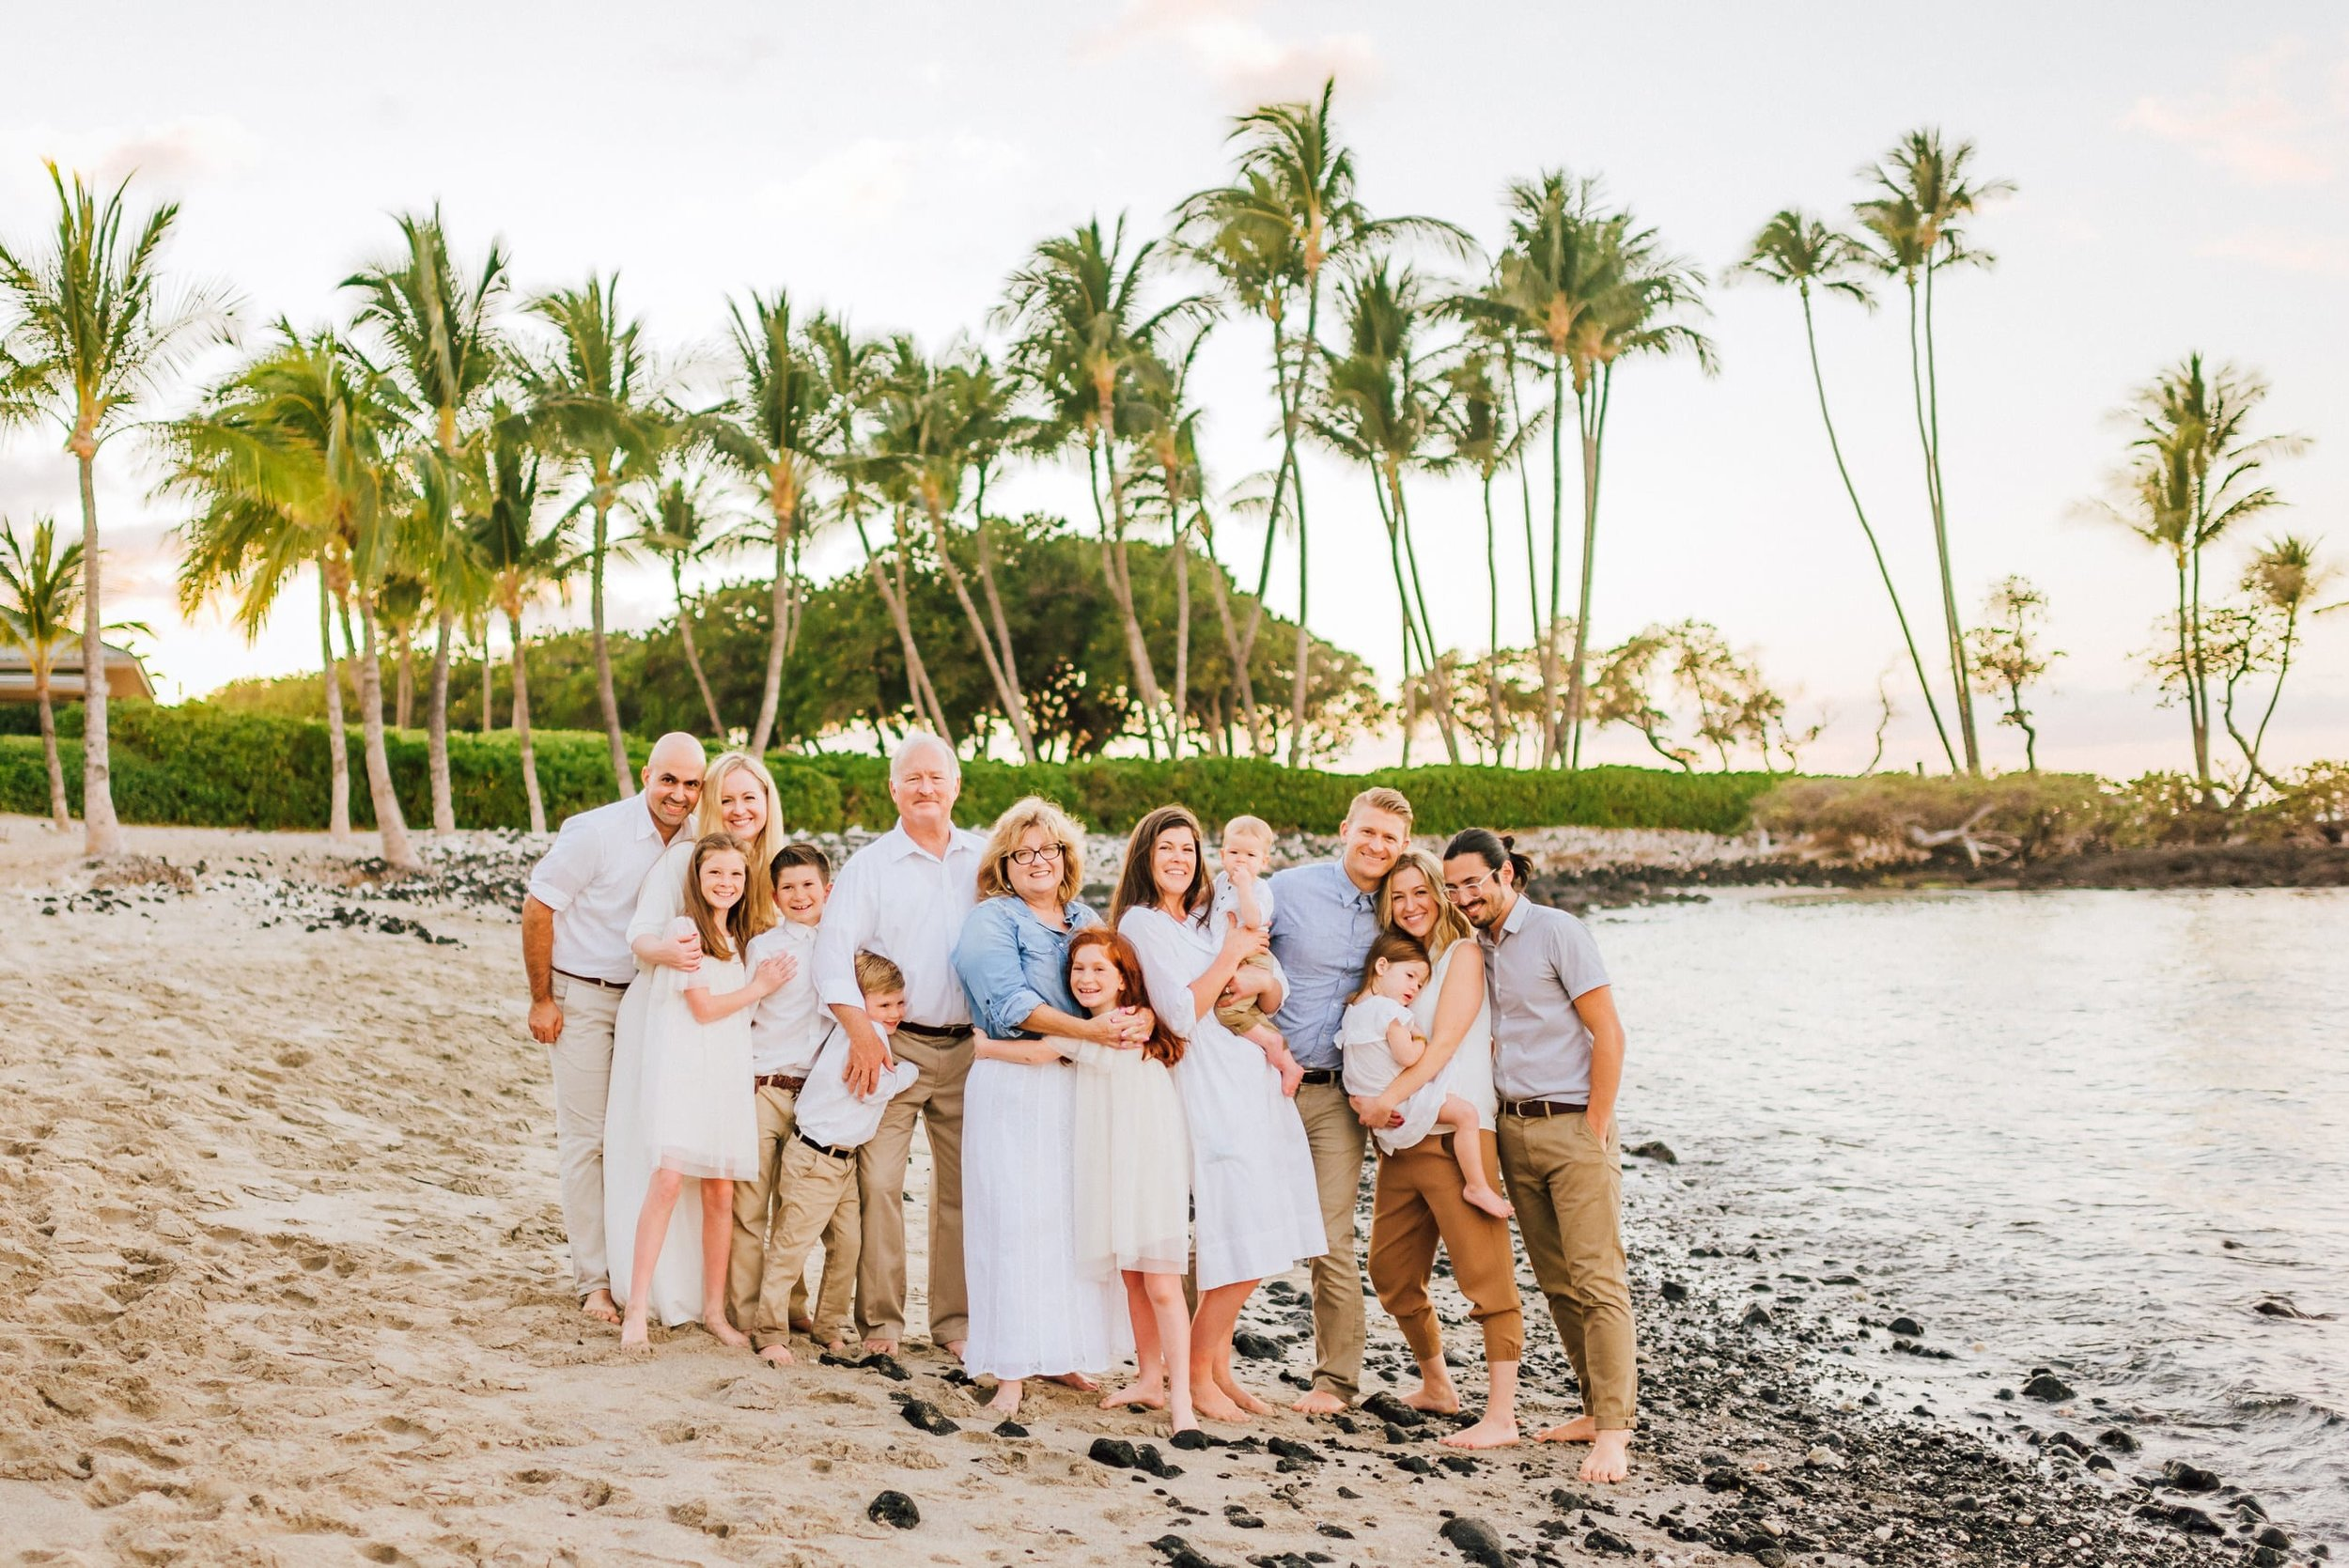 Hawaii-Family-Photographer-Waikoloa-Fairmont-Hualalai-Mauna-Kea-34.jpg